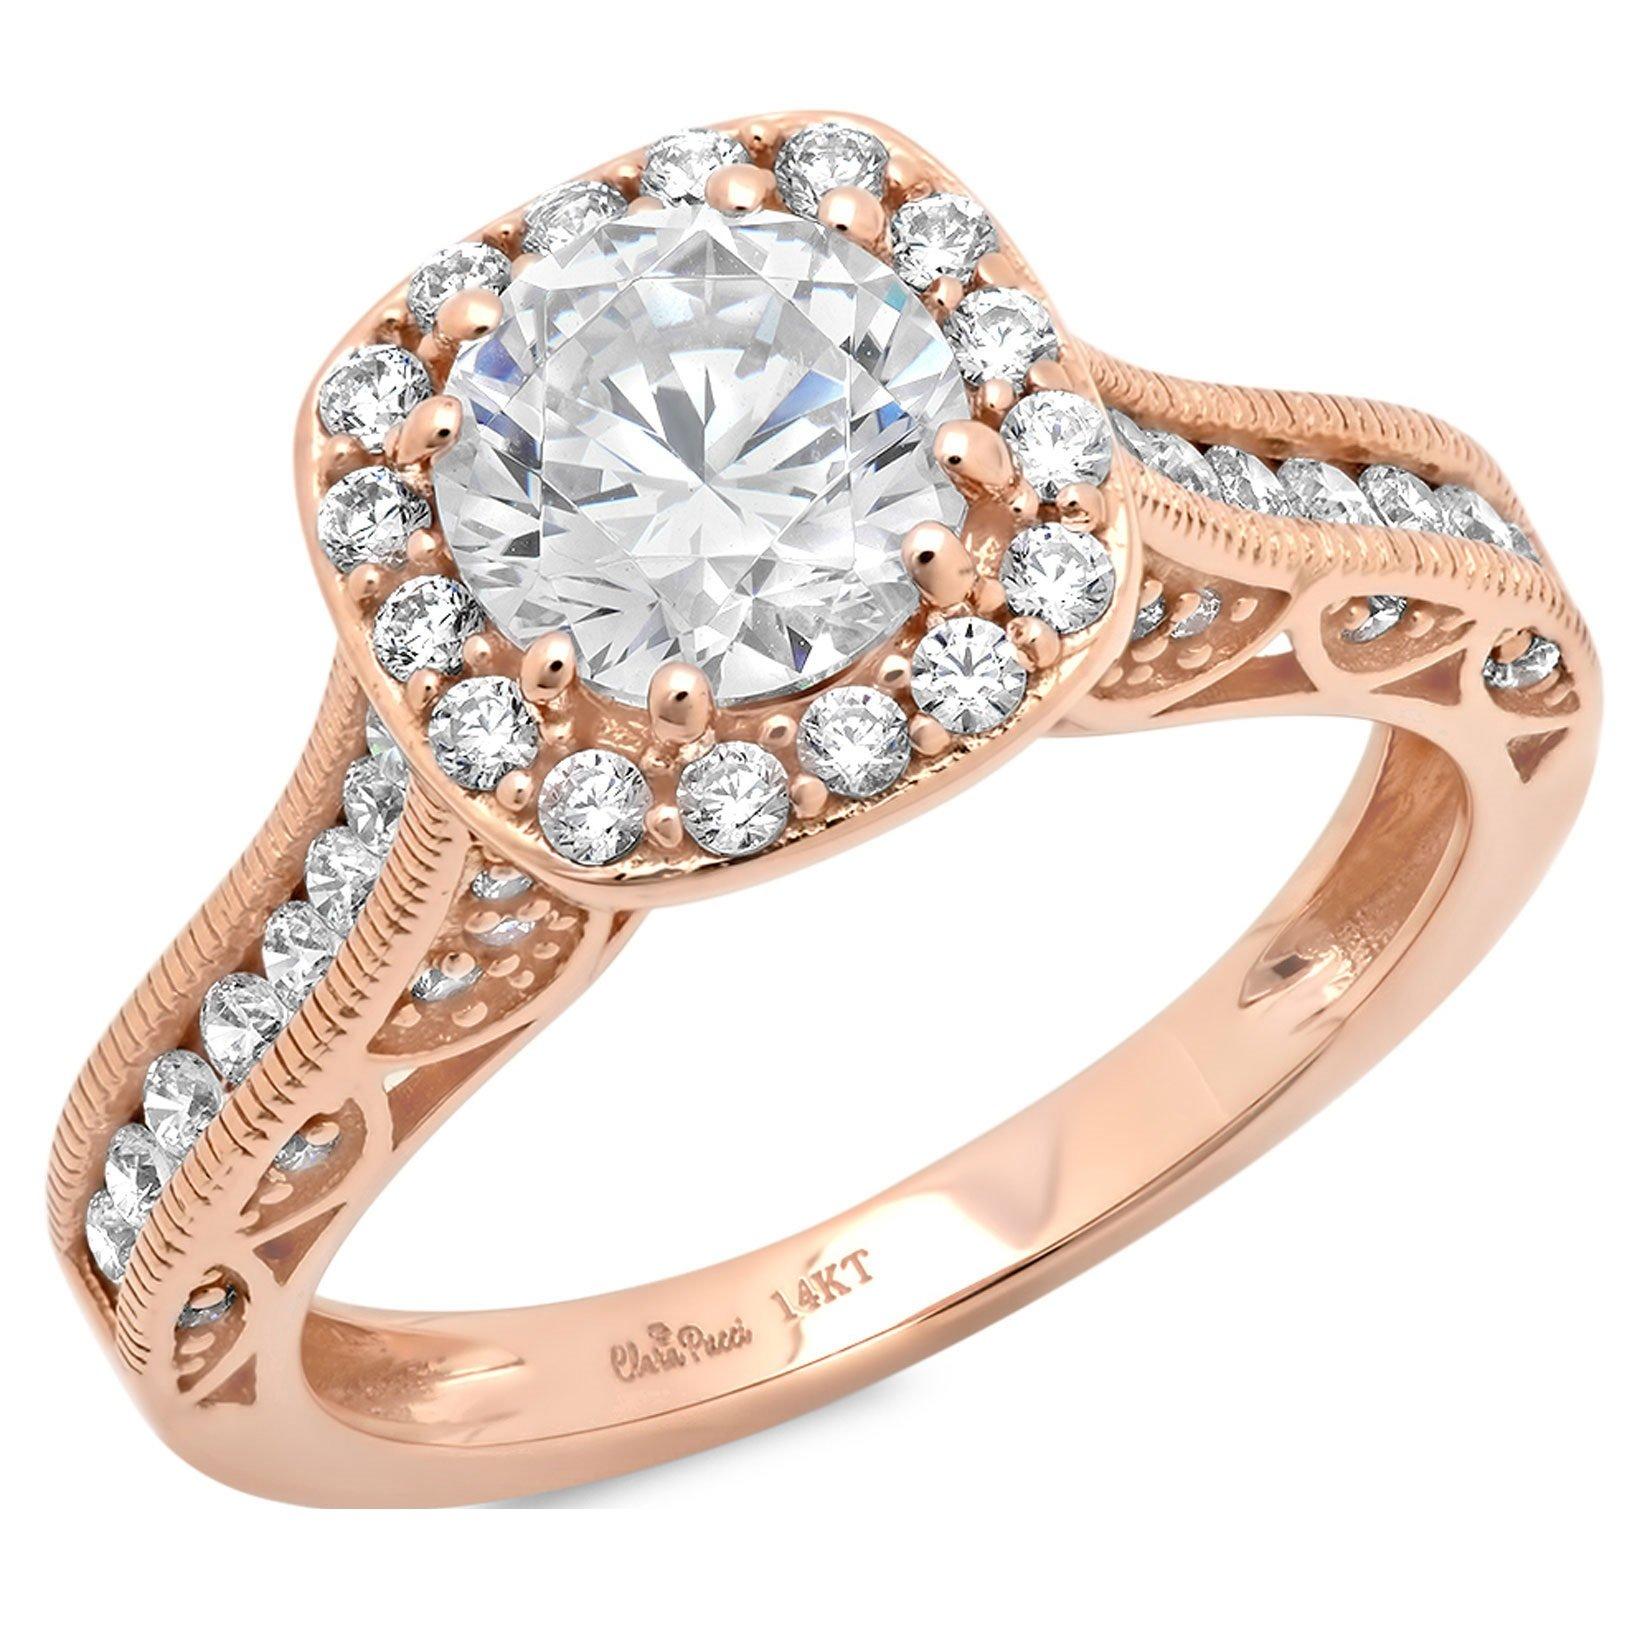 Clara Pucci 2.0 CT Round Cut CZ Pave Halo Wedding Bridal Engagement Ring Band 14k Rose Gold, Size 3.5 by Clara Pucci